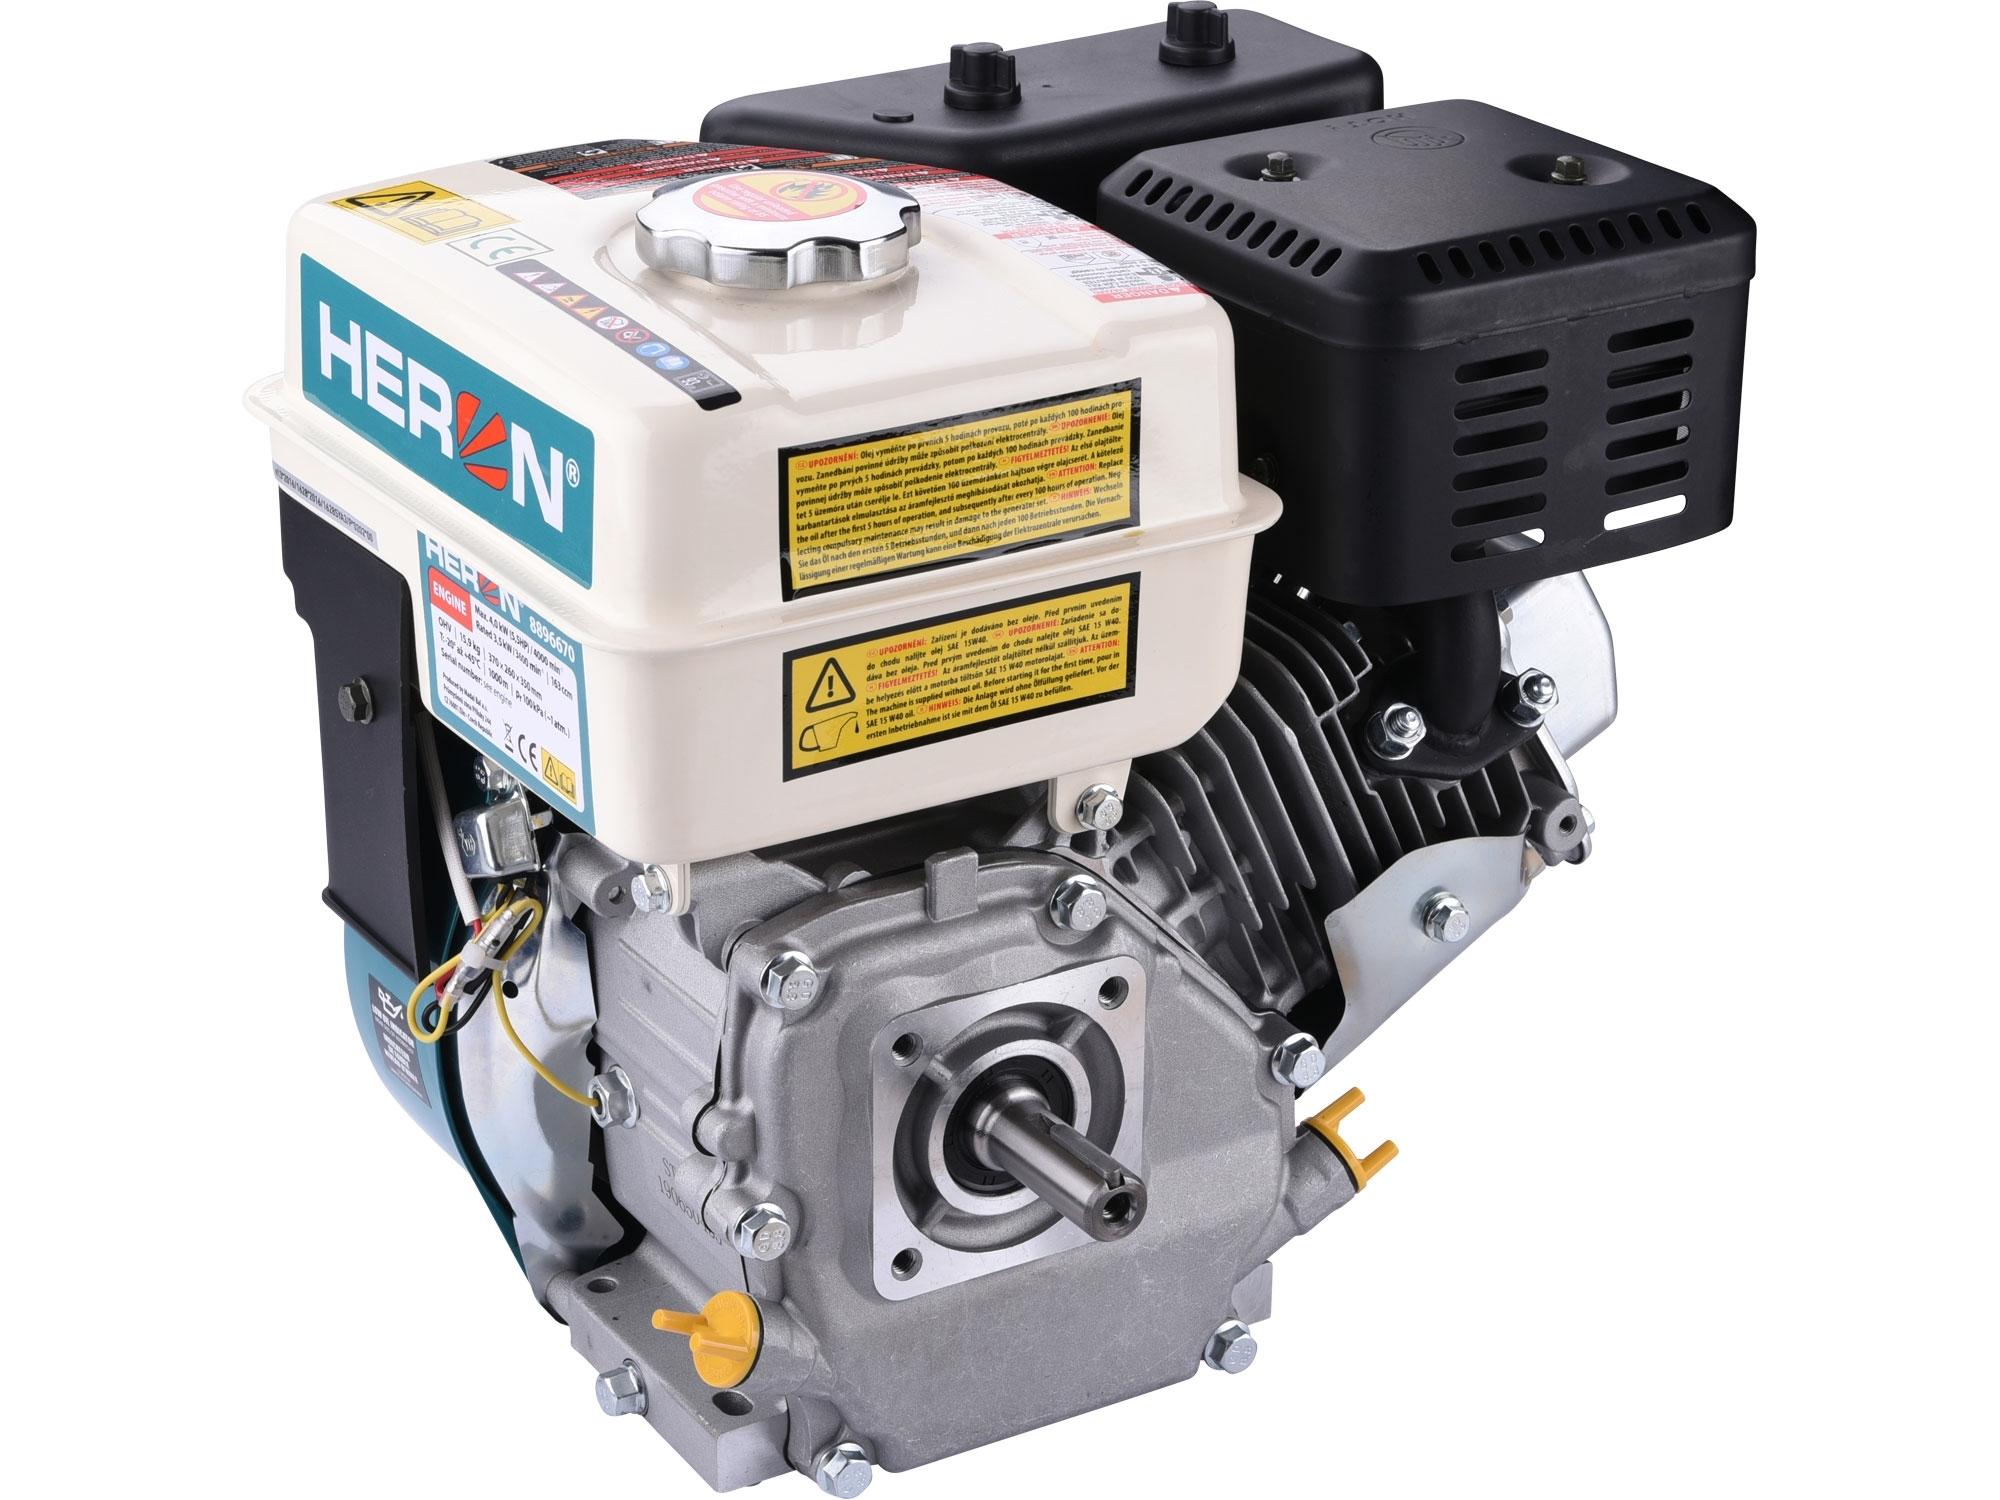 HERON motor samostatný, 163ccm, 5,5HP